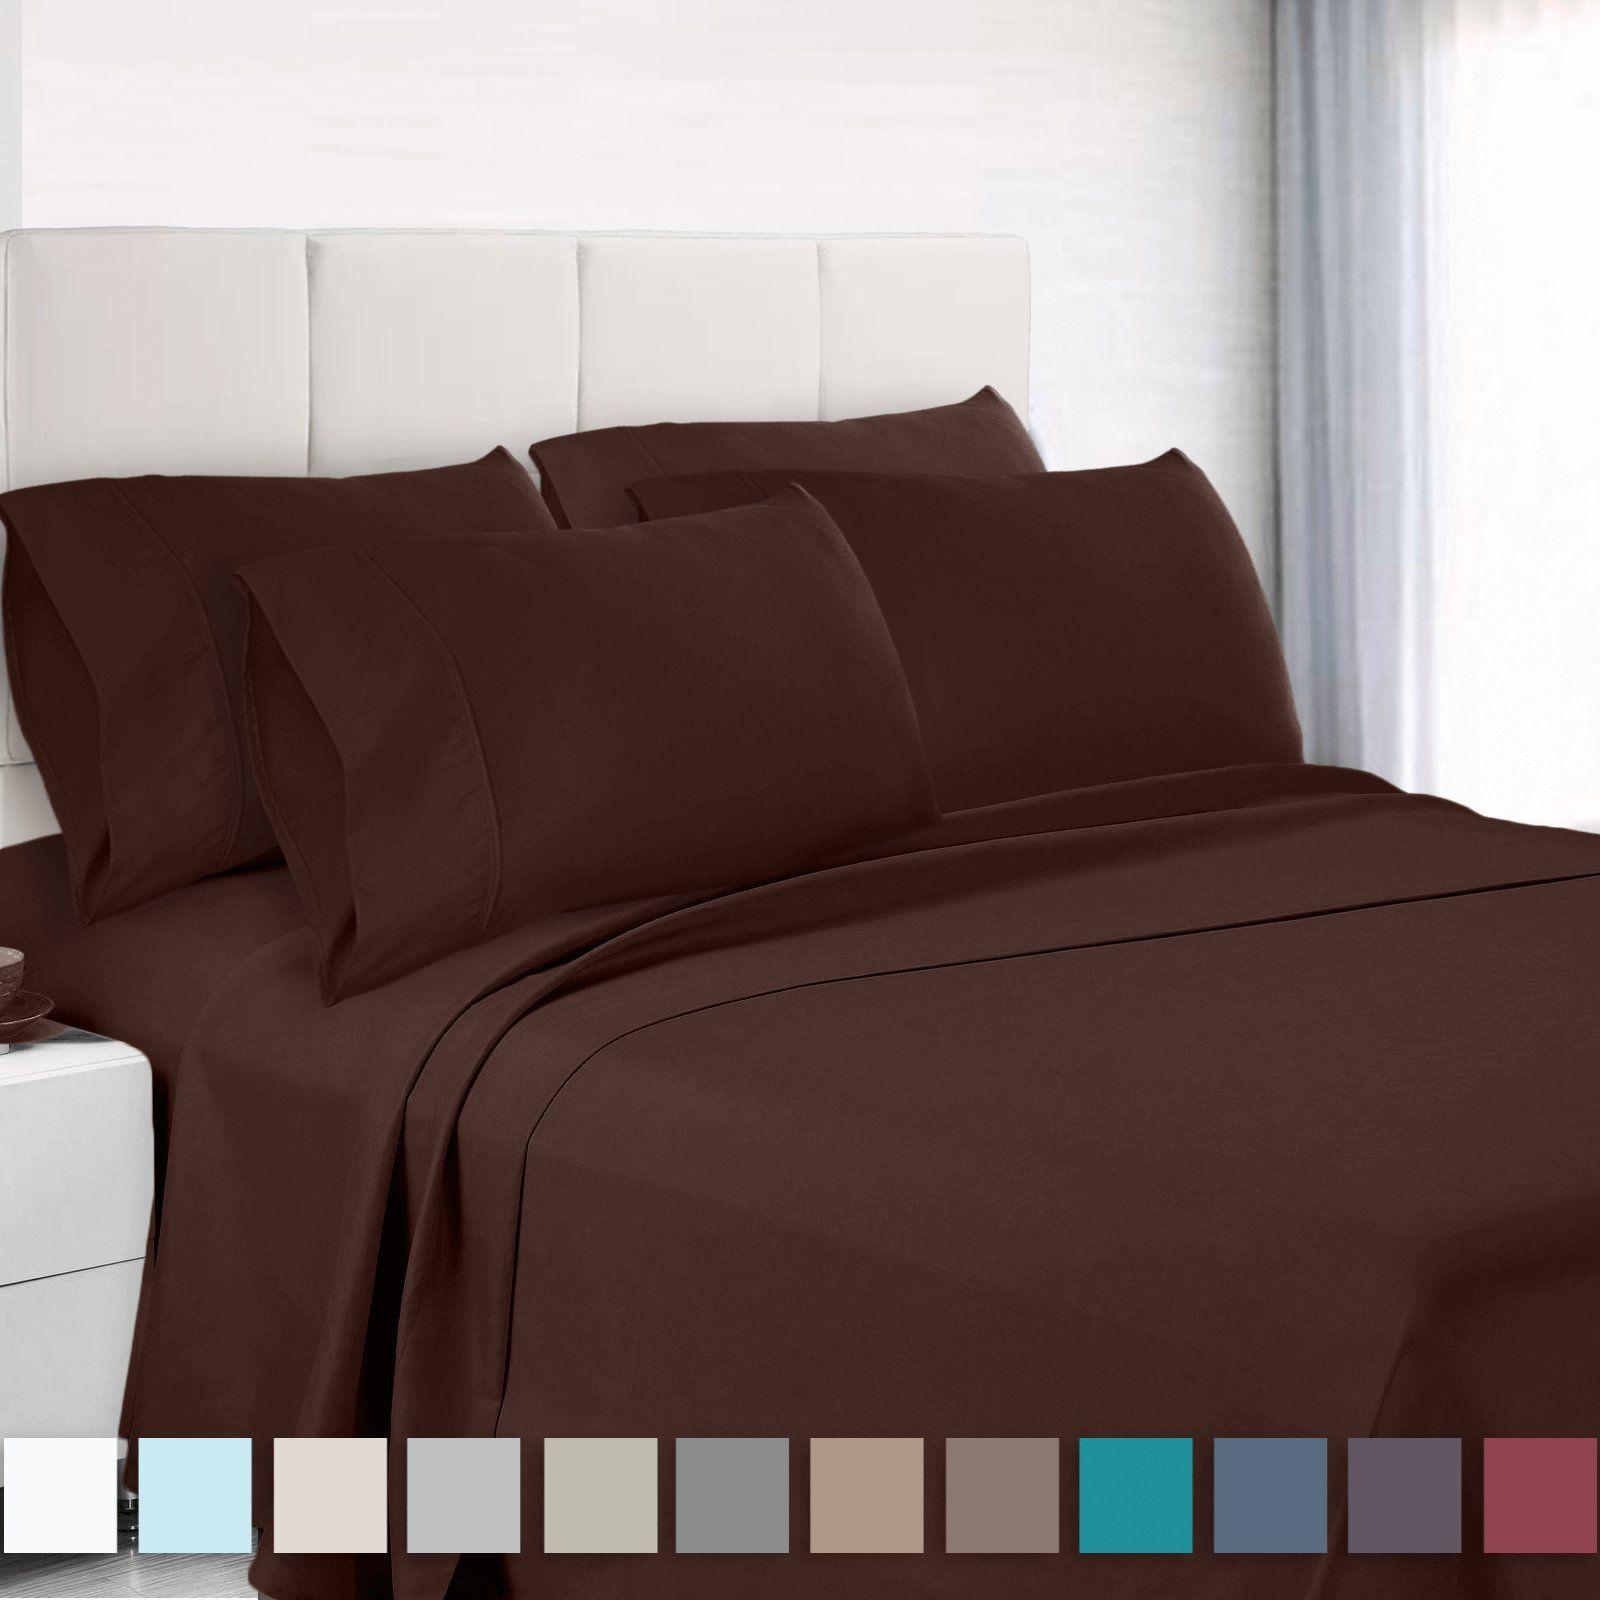 Empyrean Bedding Premium 7Piece Bed Sheet and Pillow Case